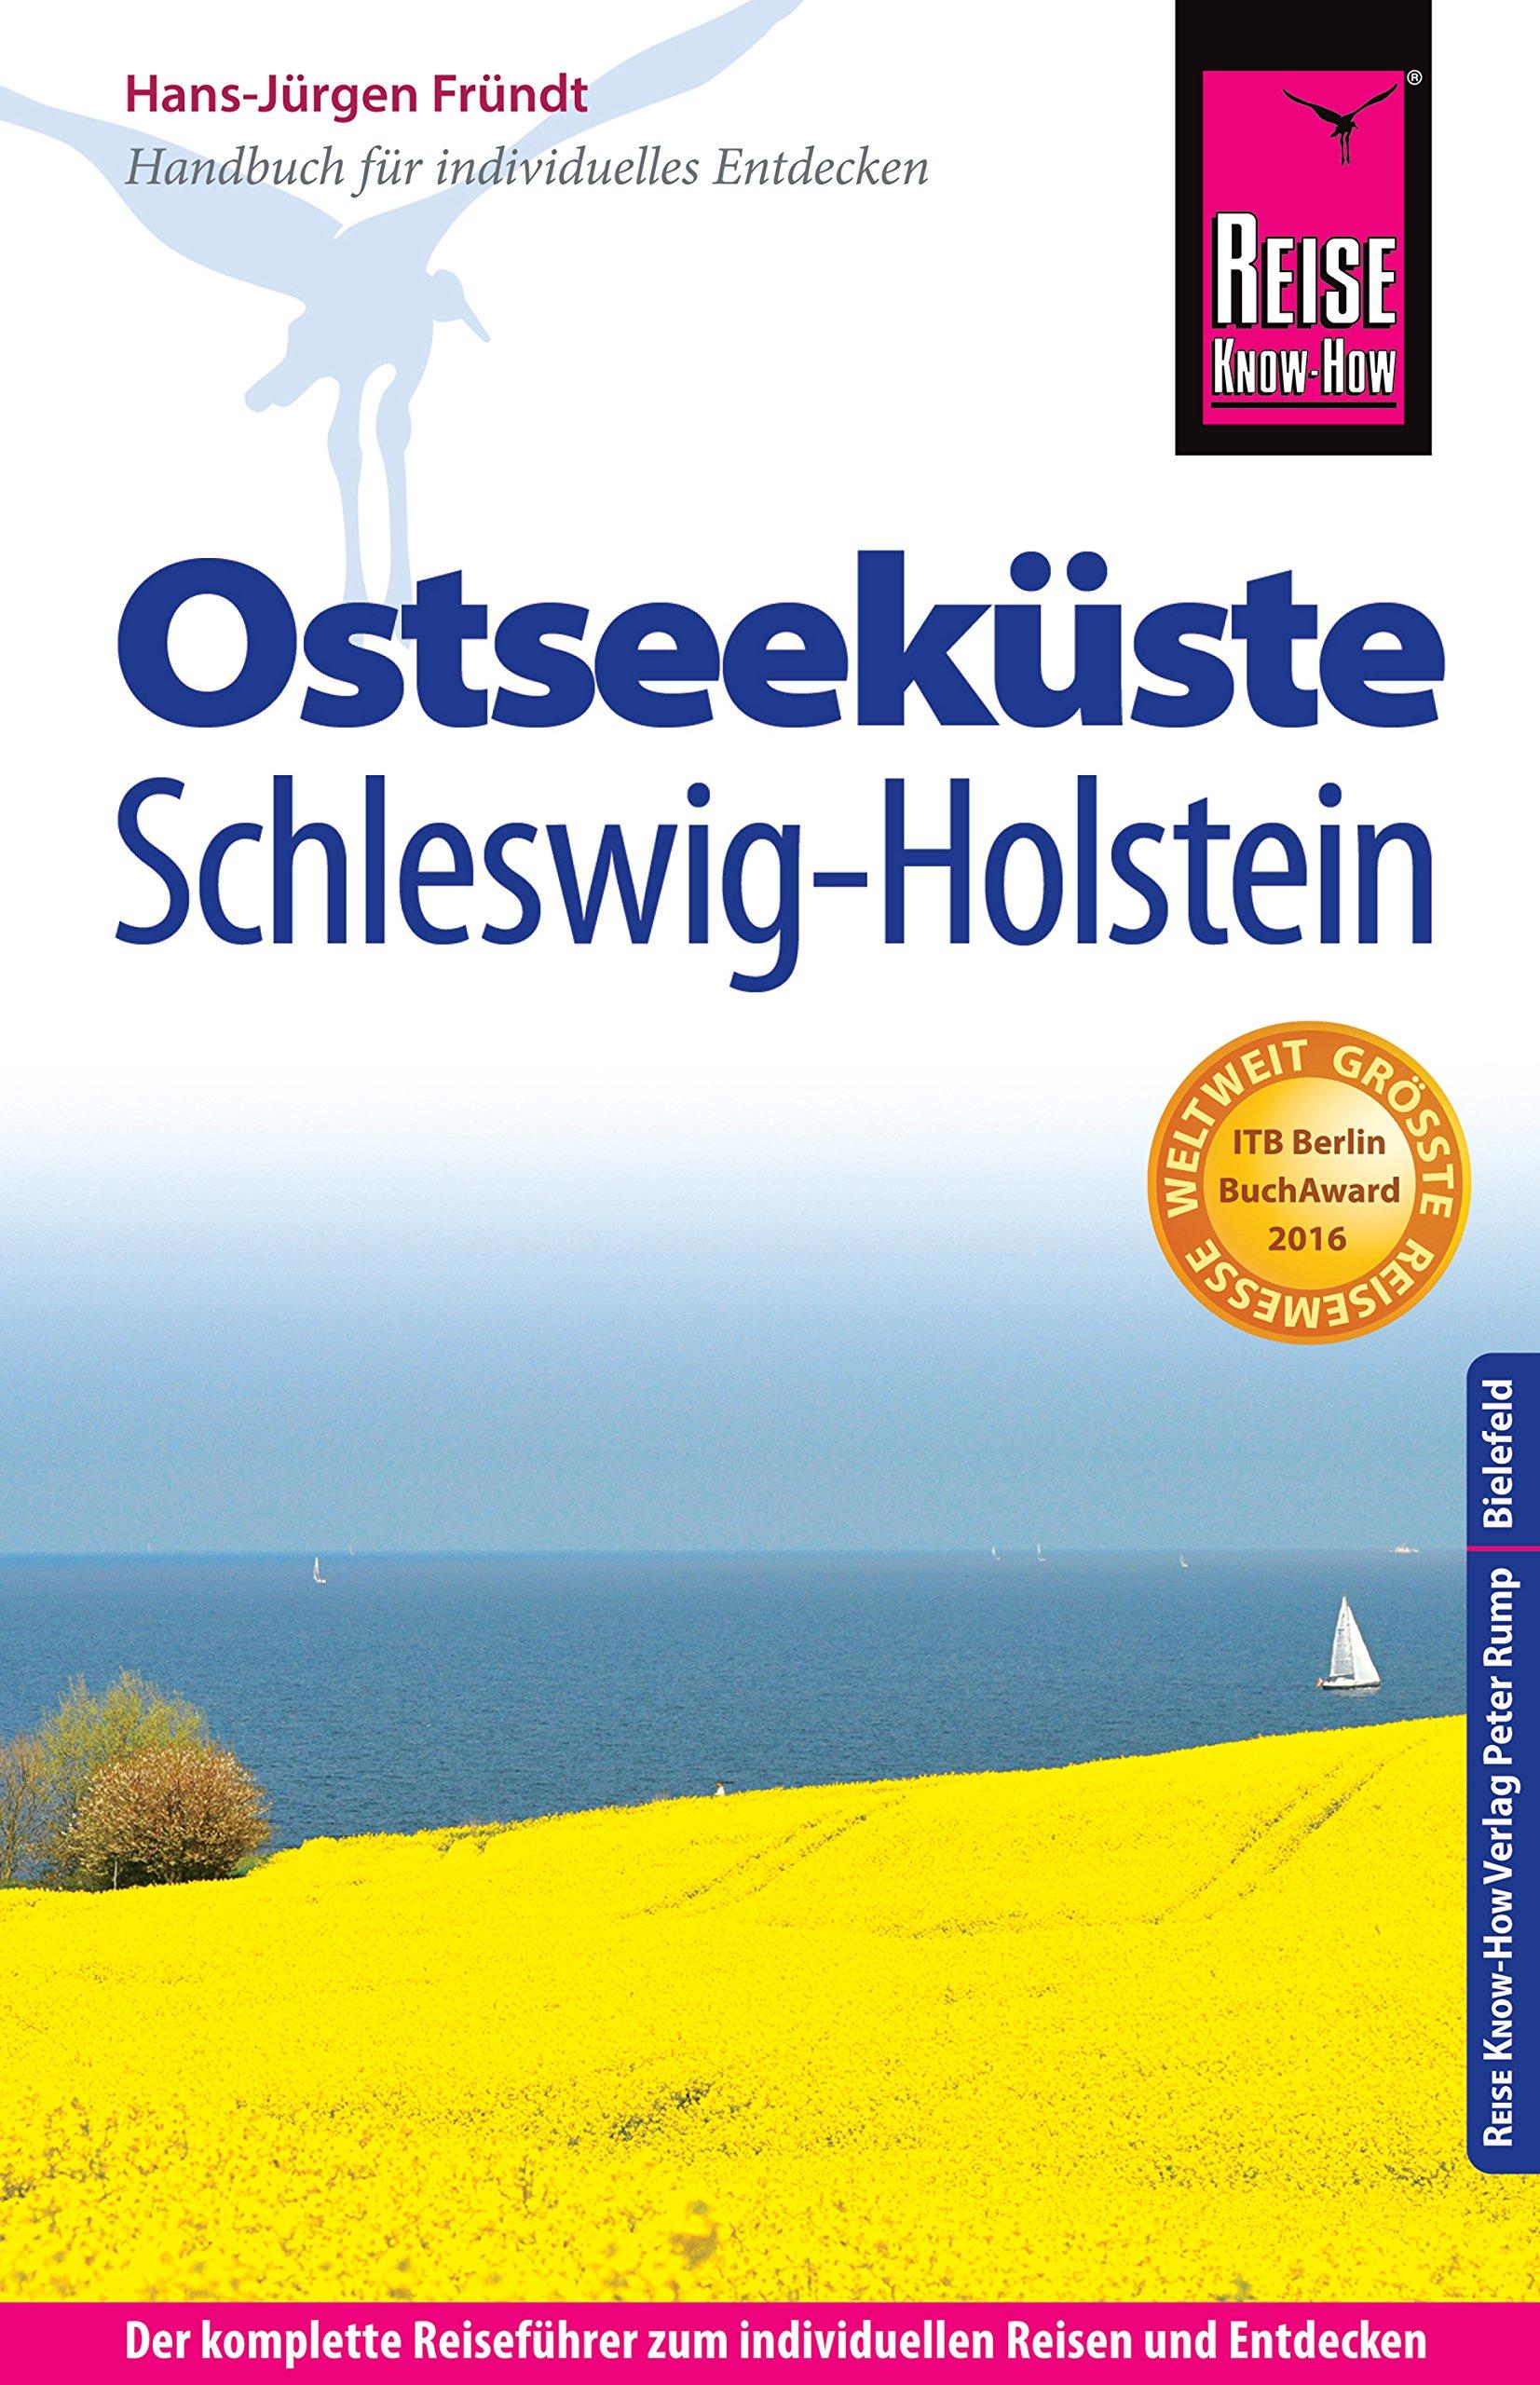 91LO93Q9aTL Urlaub im Ostseeheilbad Timmendorfer Strand 🇩🇪 Urlaubsorte